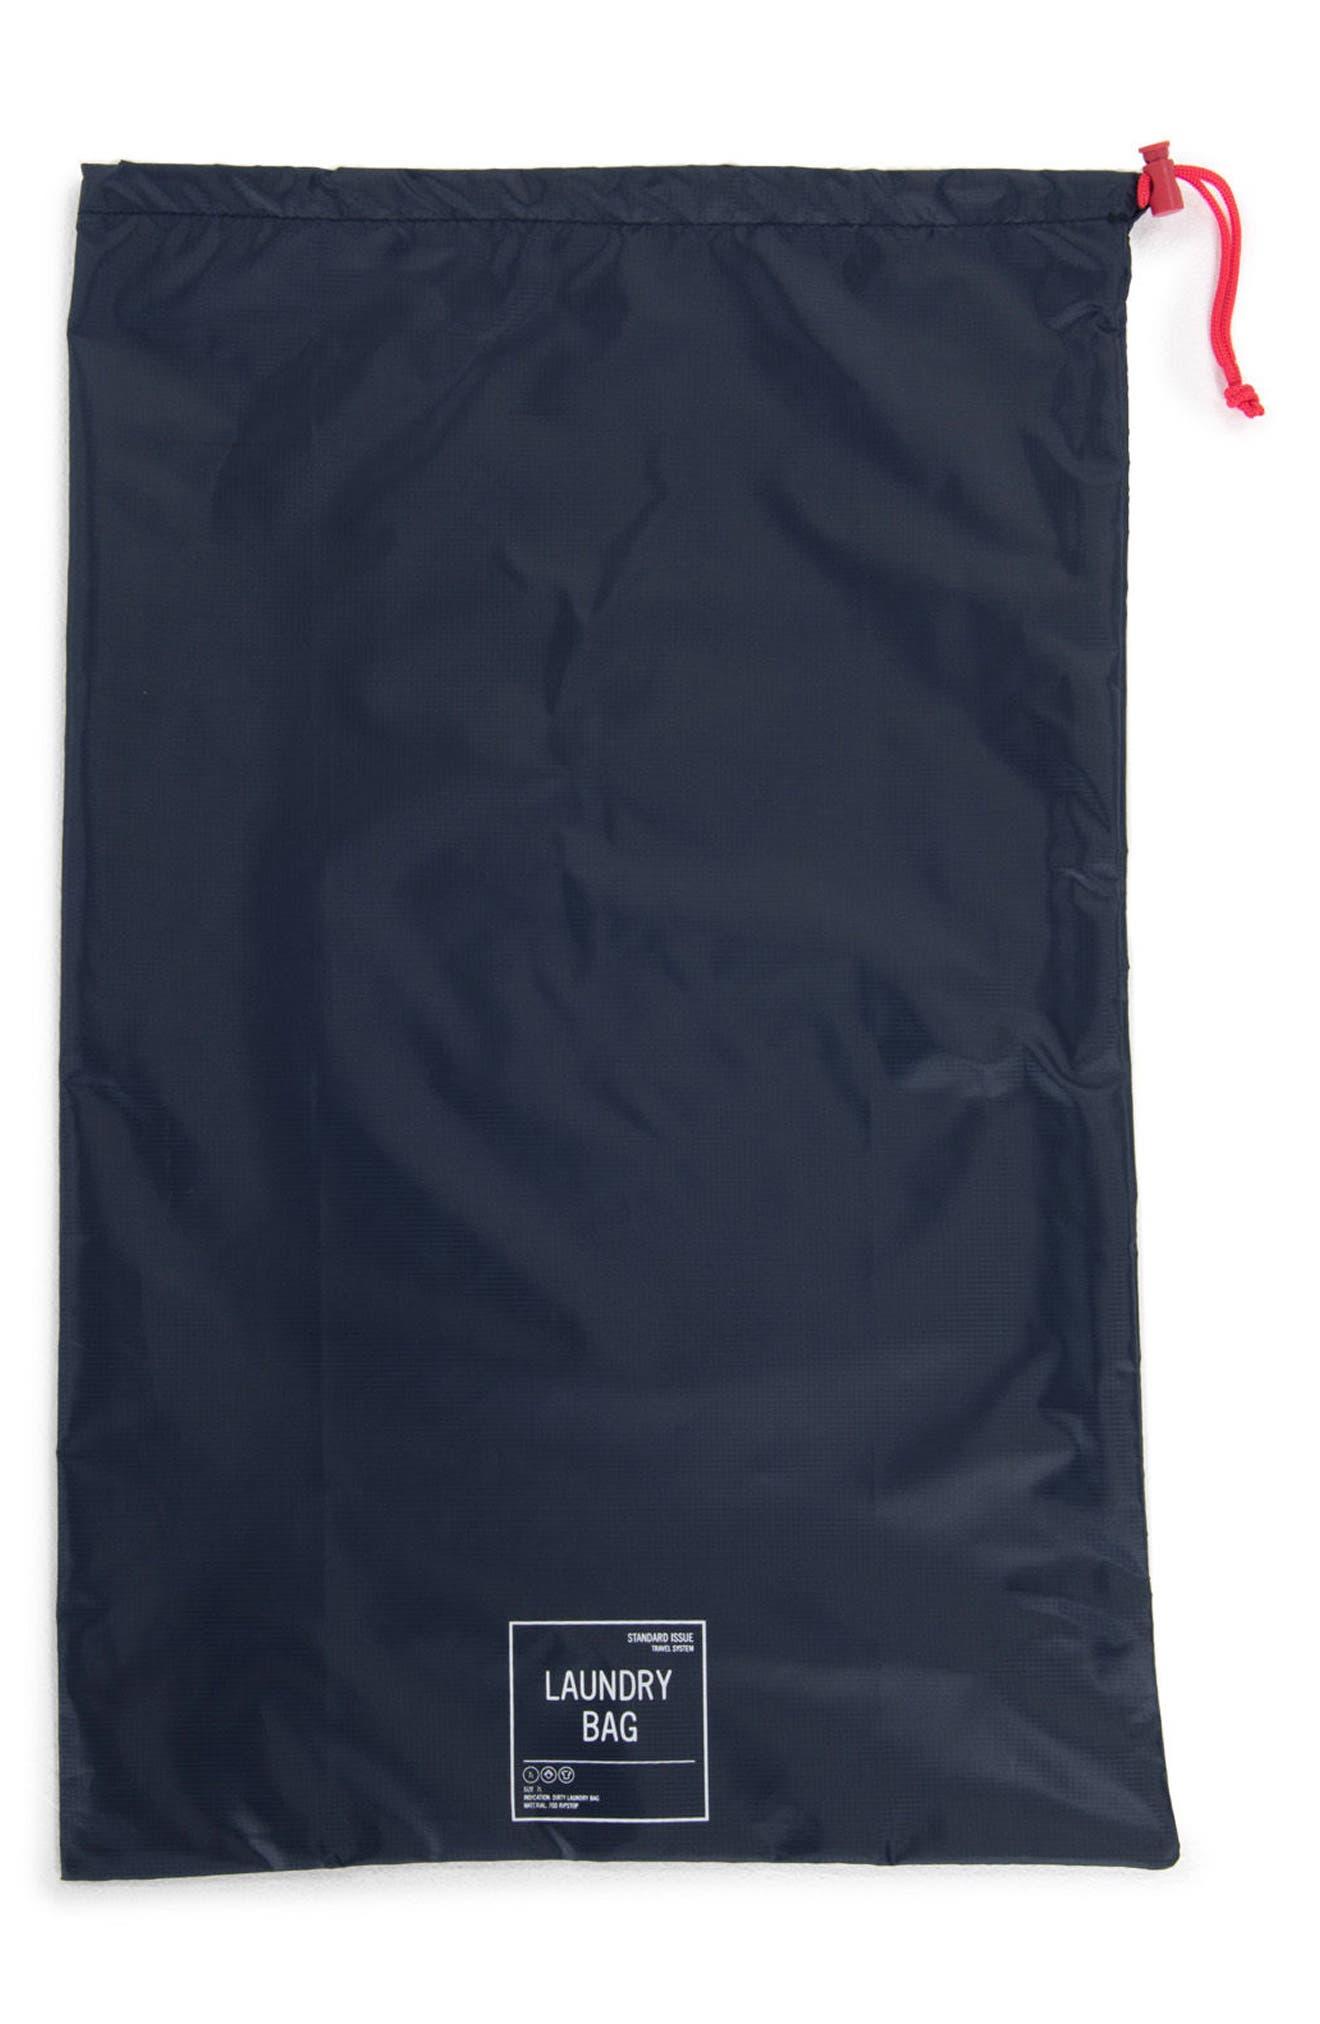 Laundry Bag Set,                             Alternate thumbnail 3, color,                             NAVY/ RED